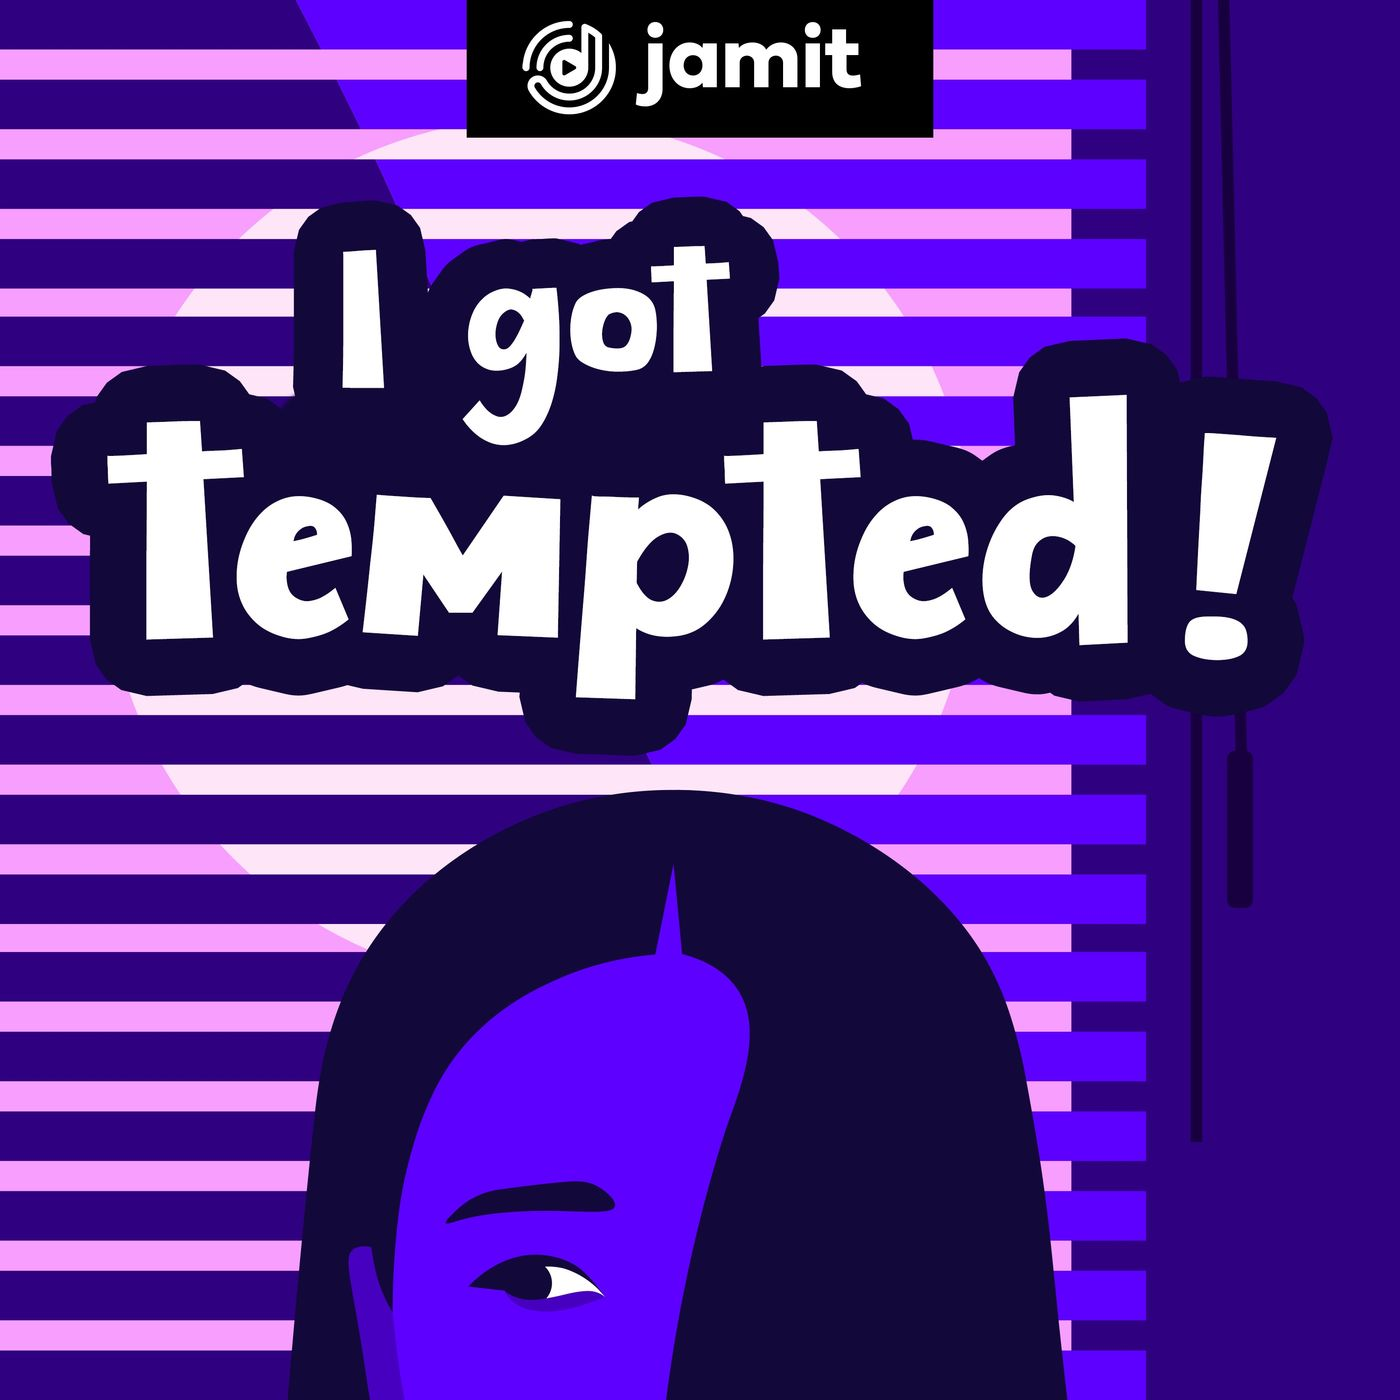 I Got Tempted on Jamit